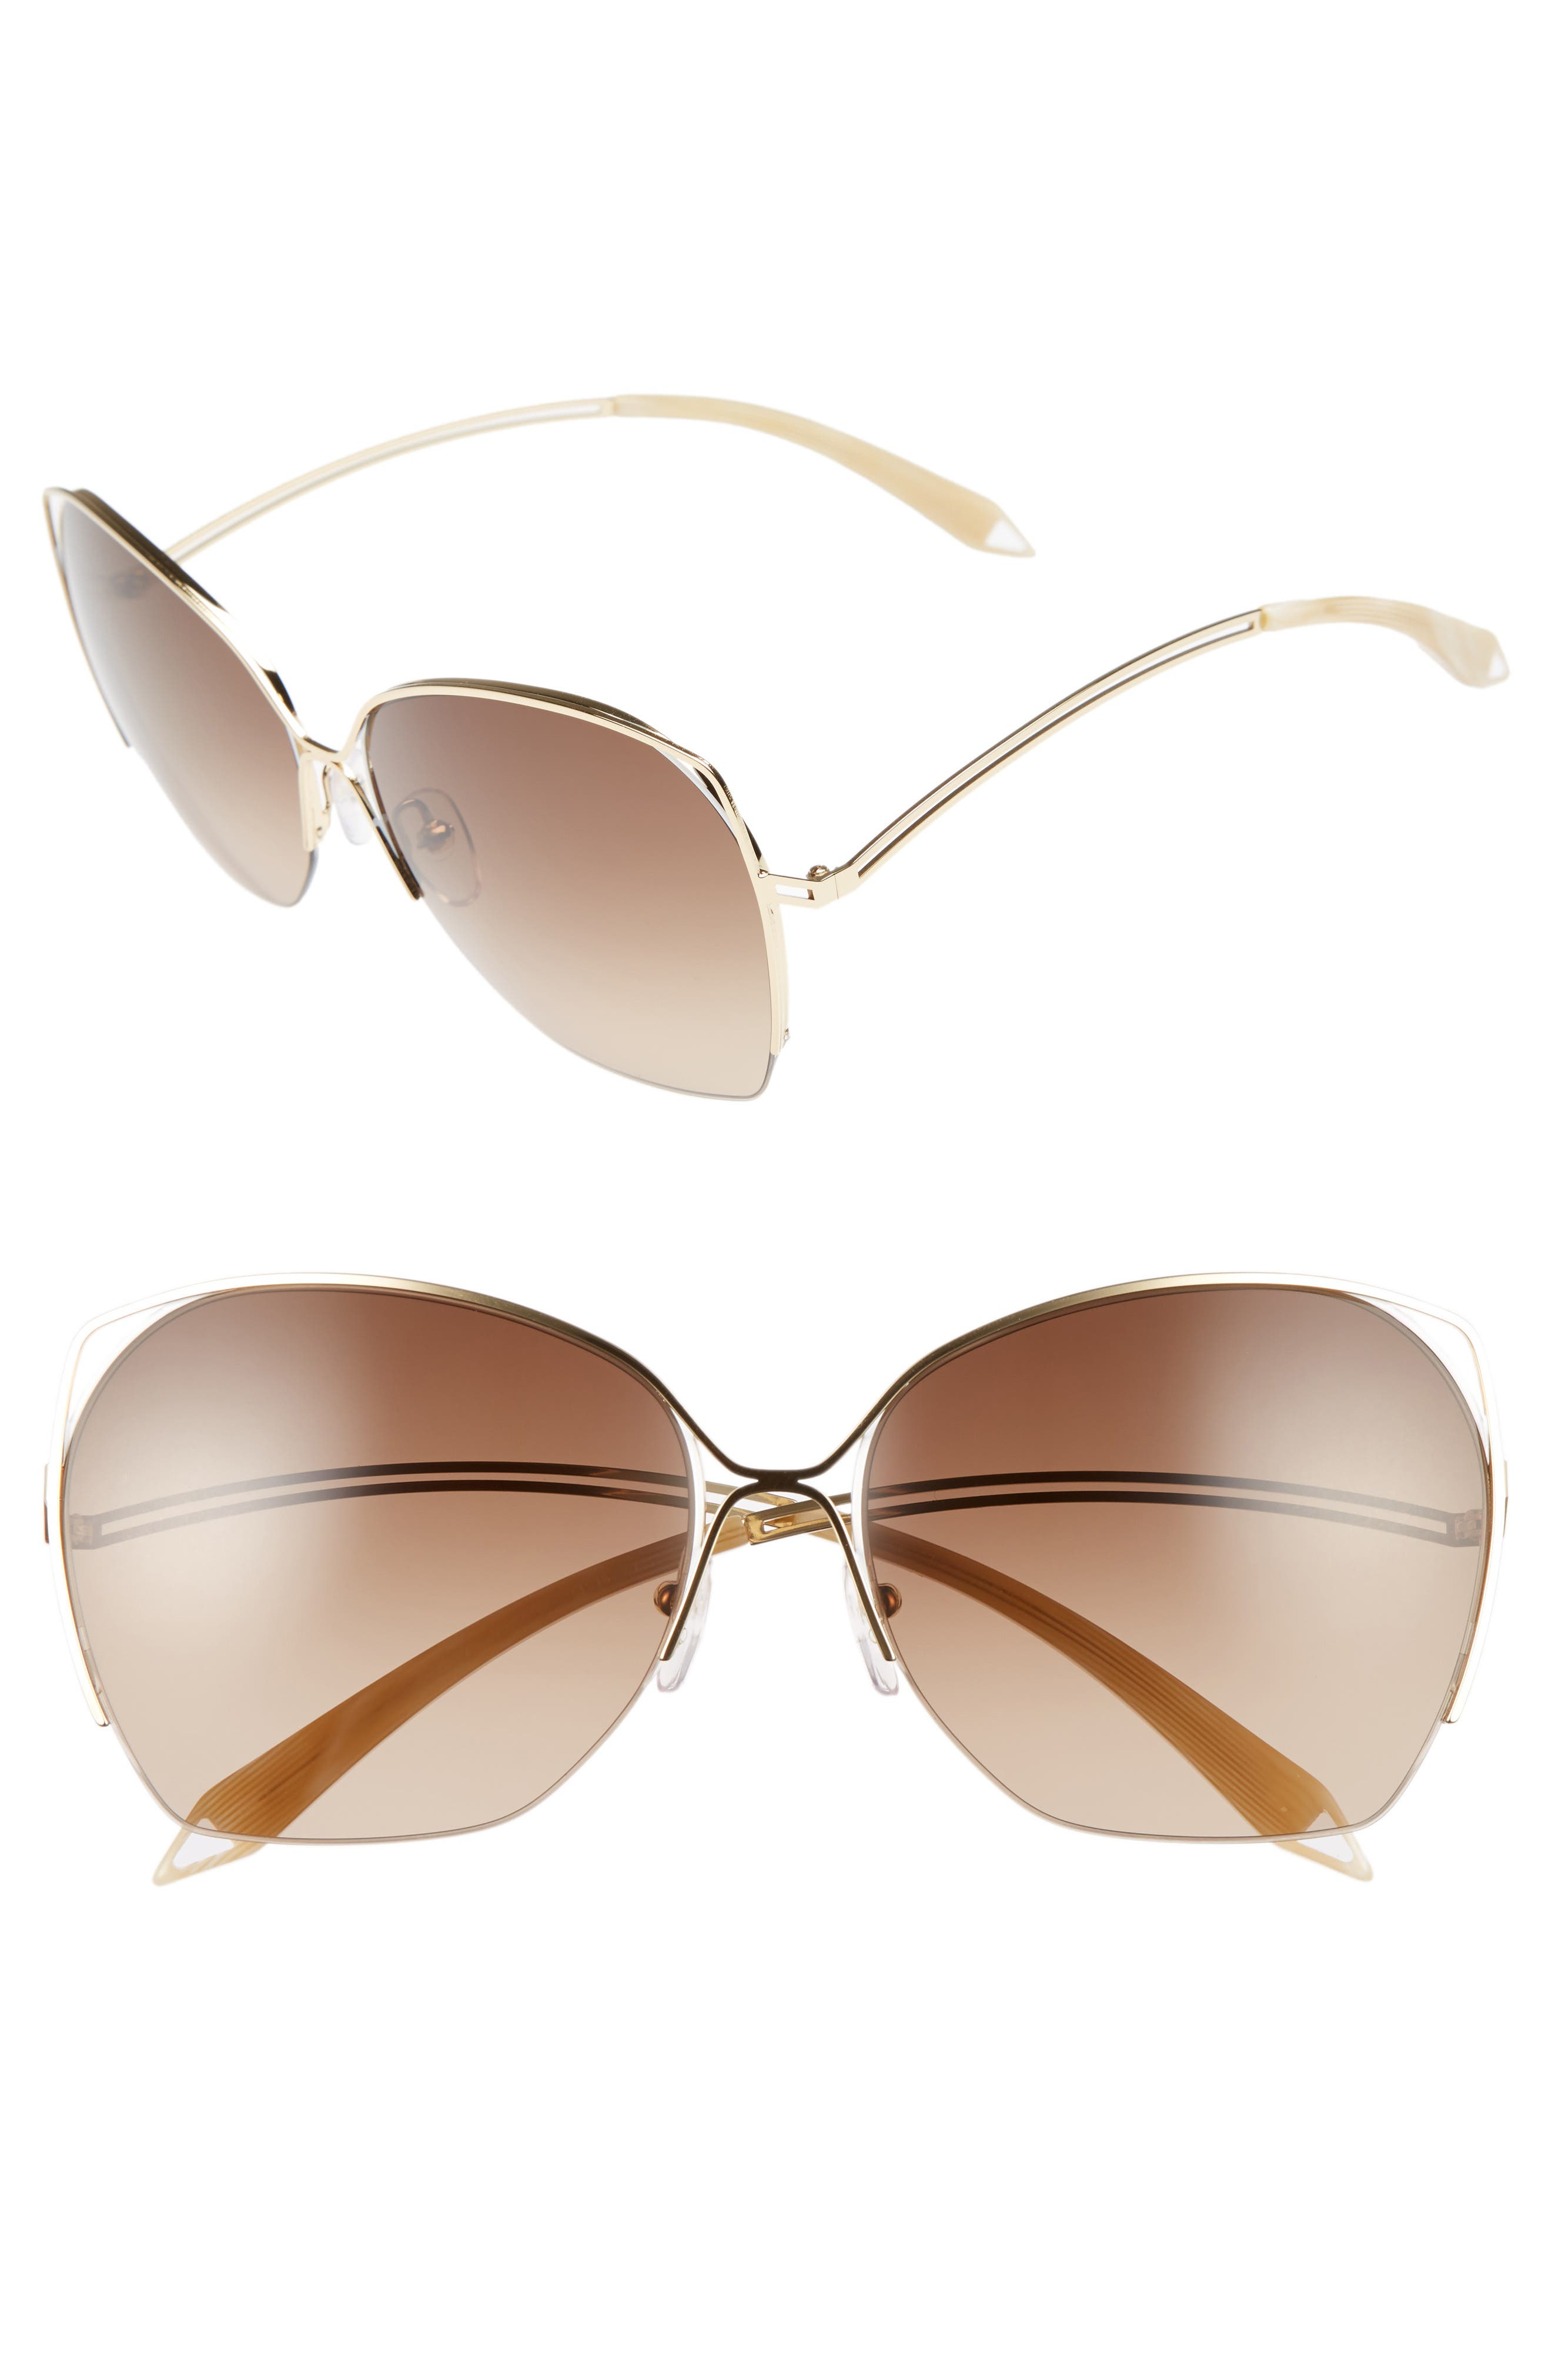 Victoria Beckham Fine Wave 61mm Sunglasses